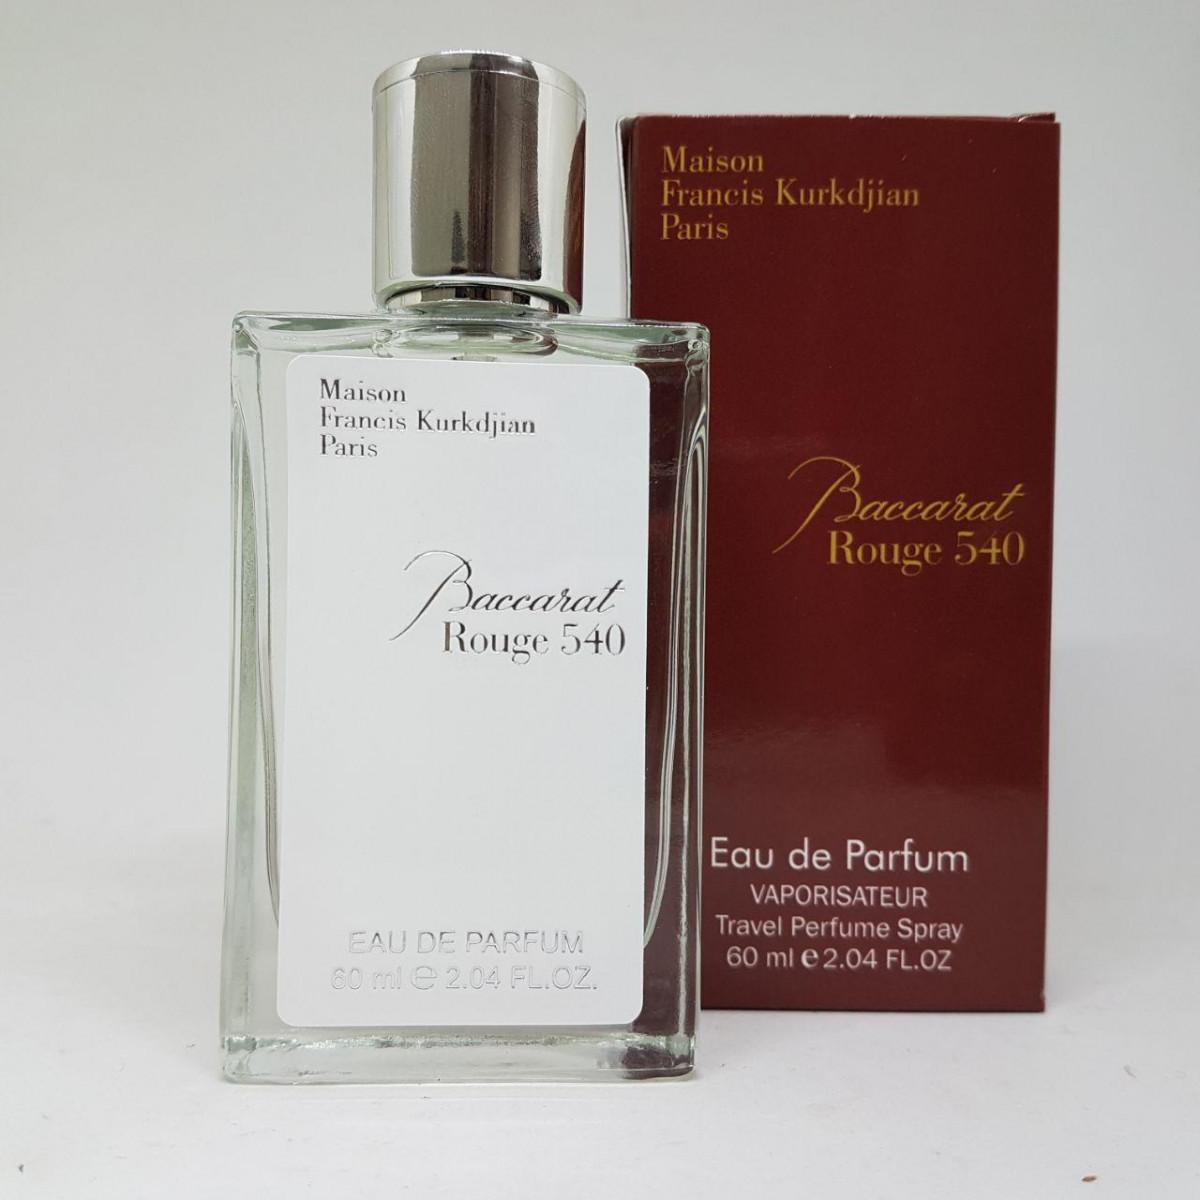 Maison Francis Kurkdjian Baccarat Rouge 540 - Travel Spray 60ml